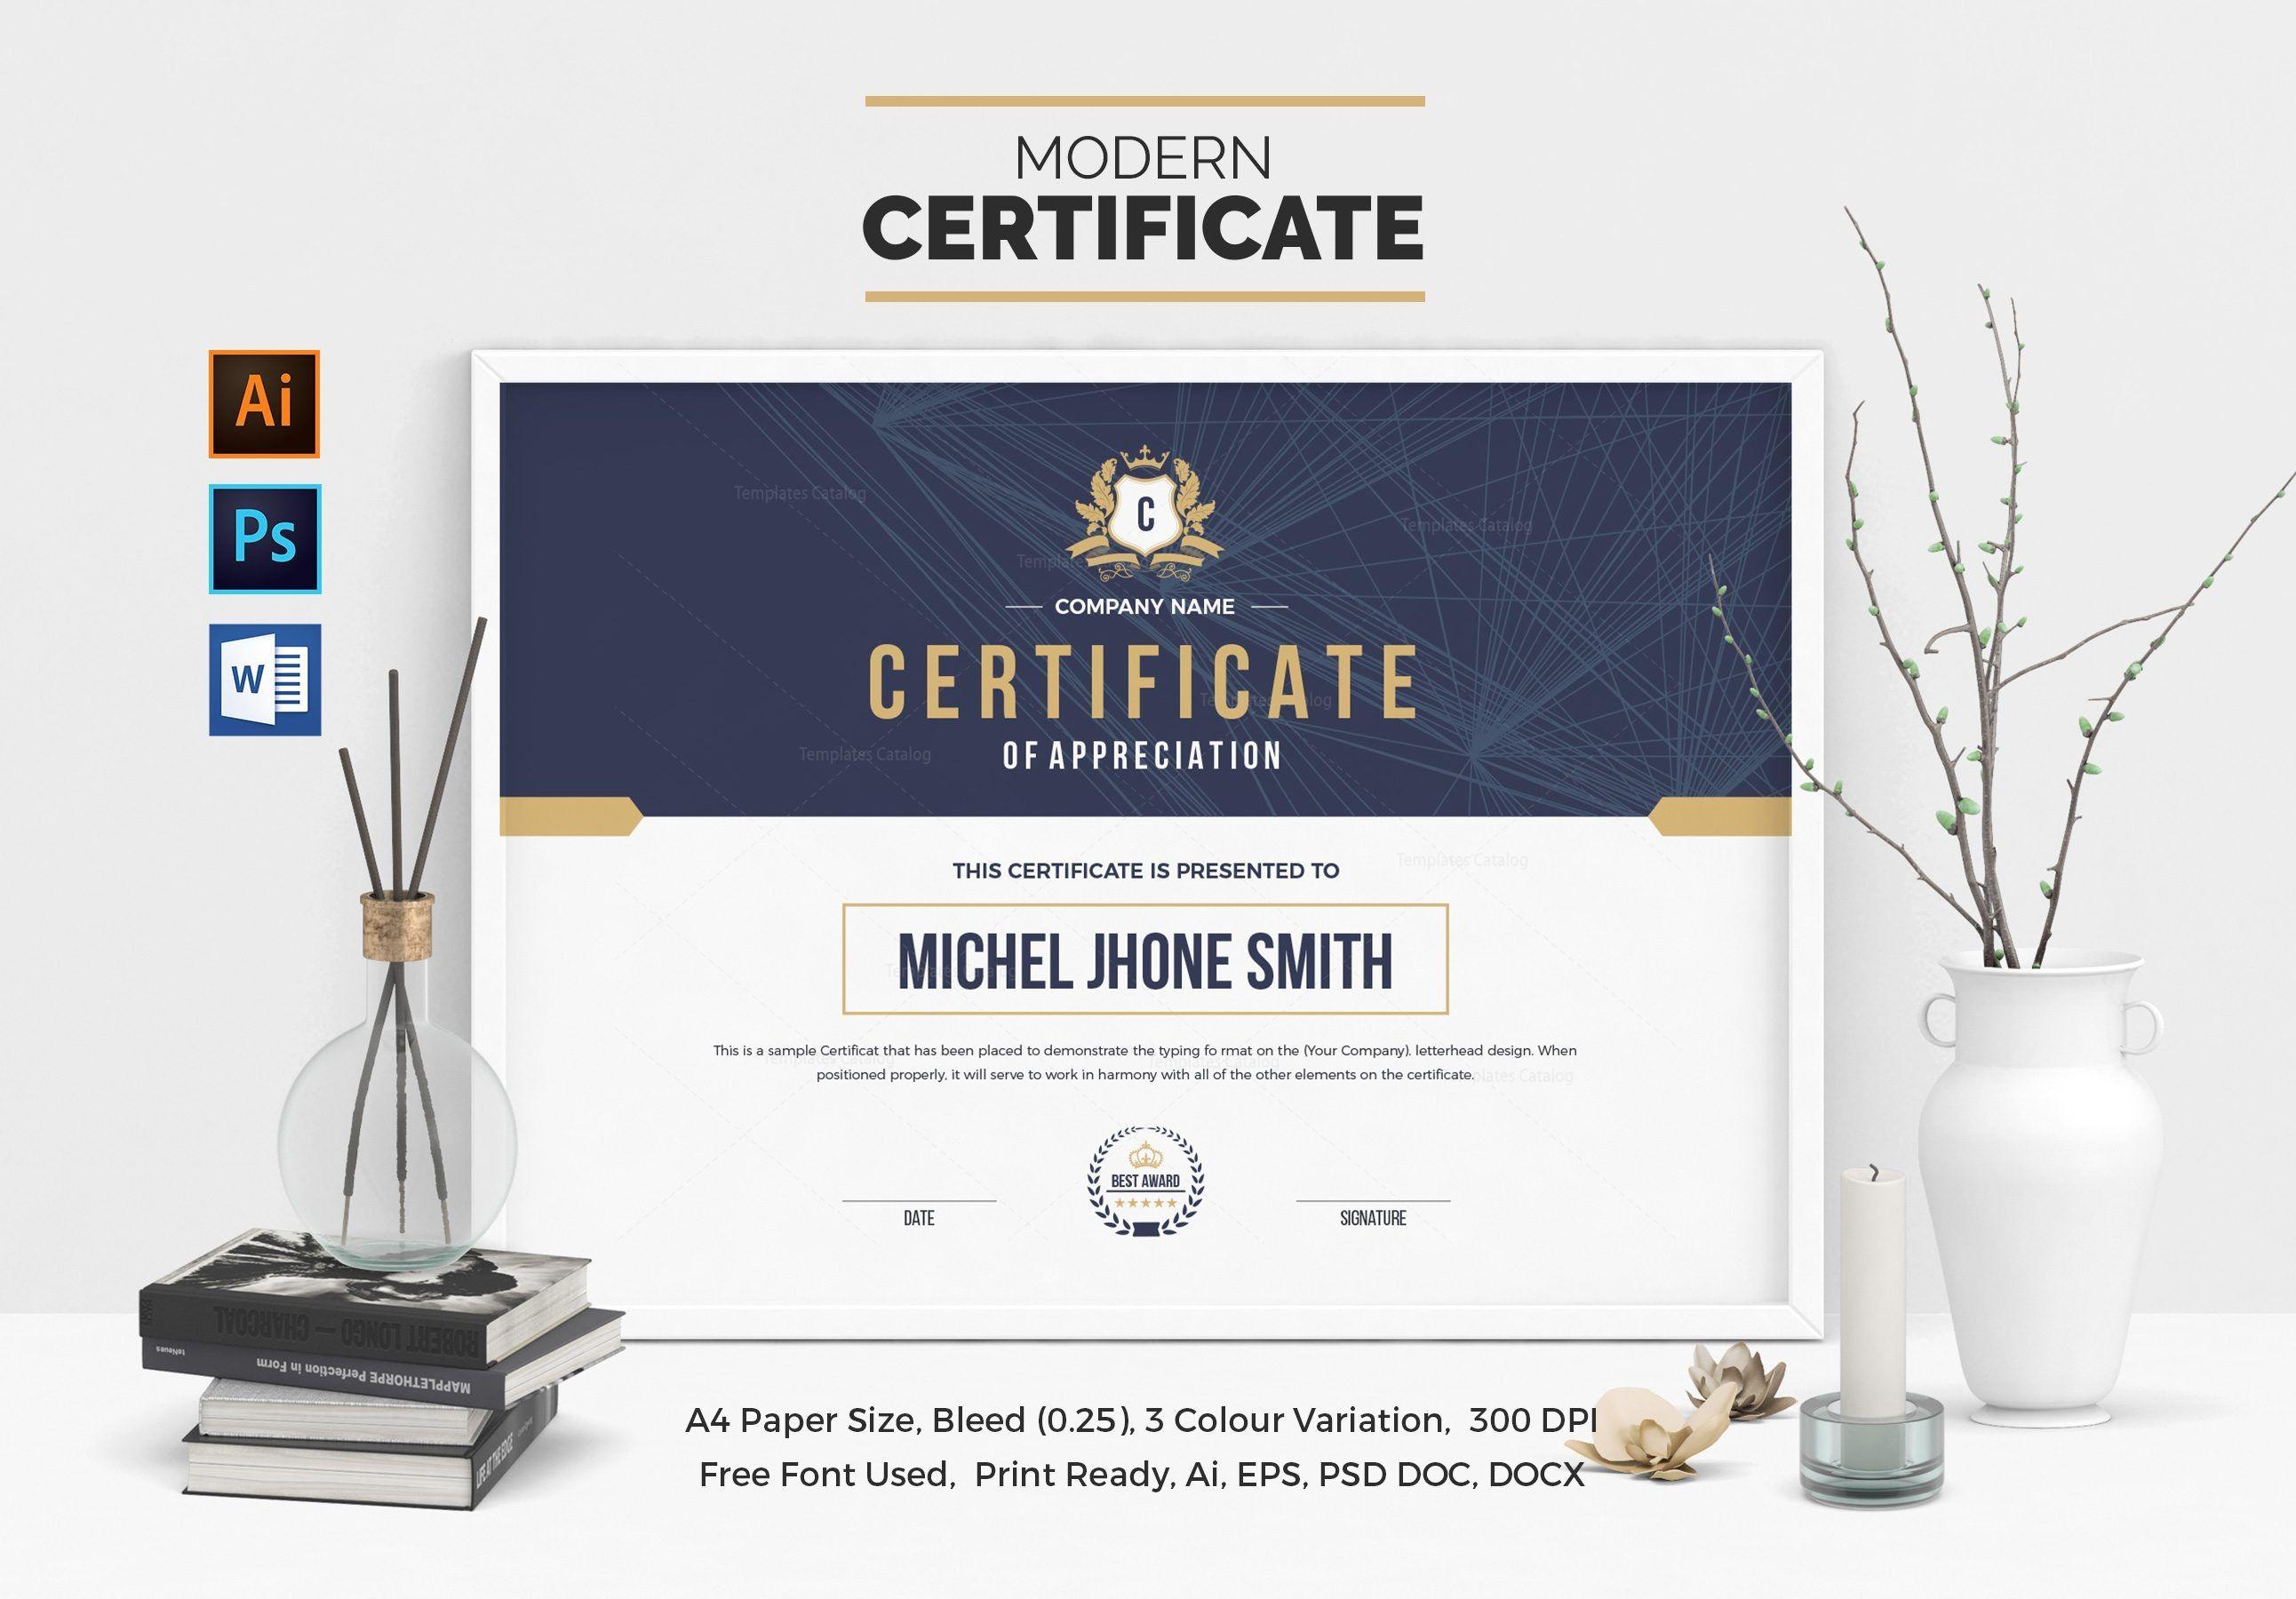 Landscape Certificate Template 000508 | Certificate Template With Regard To Landscape Certificate Templates